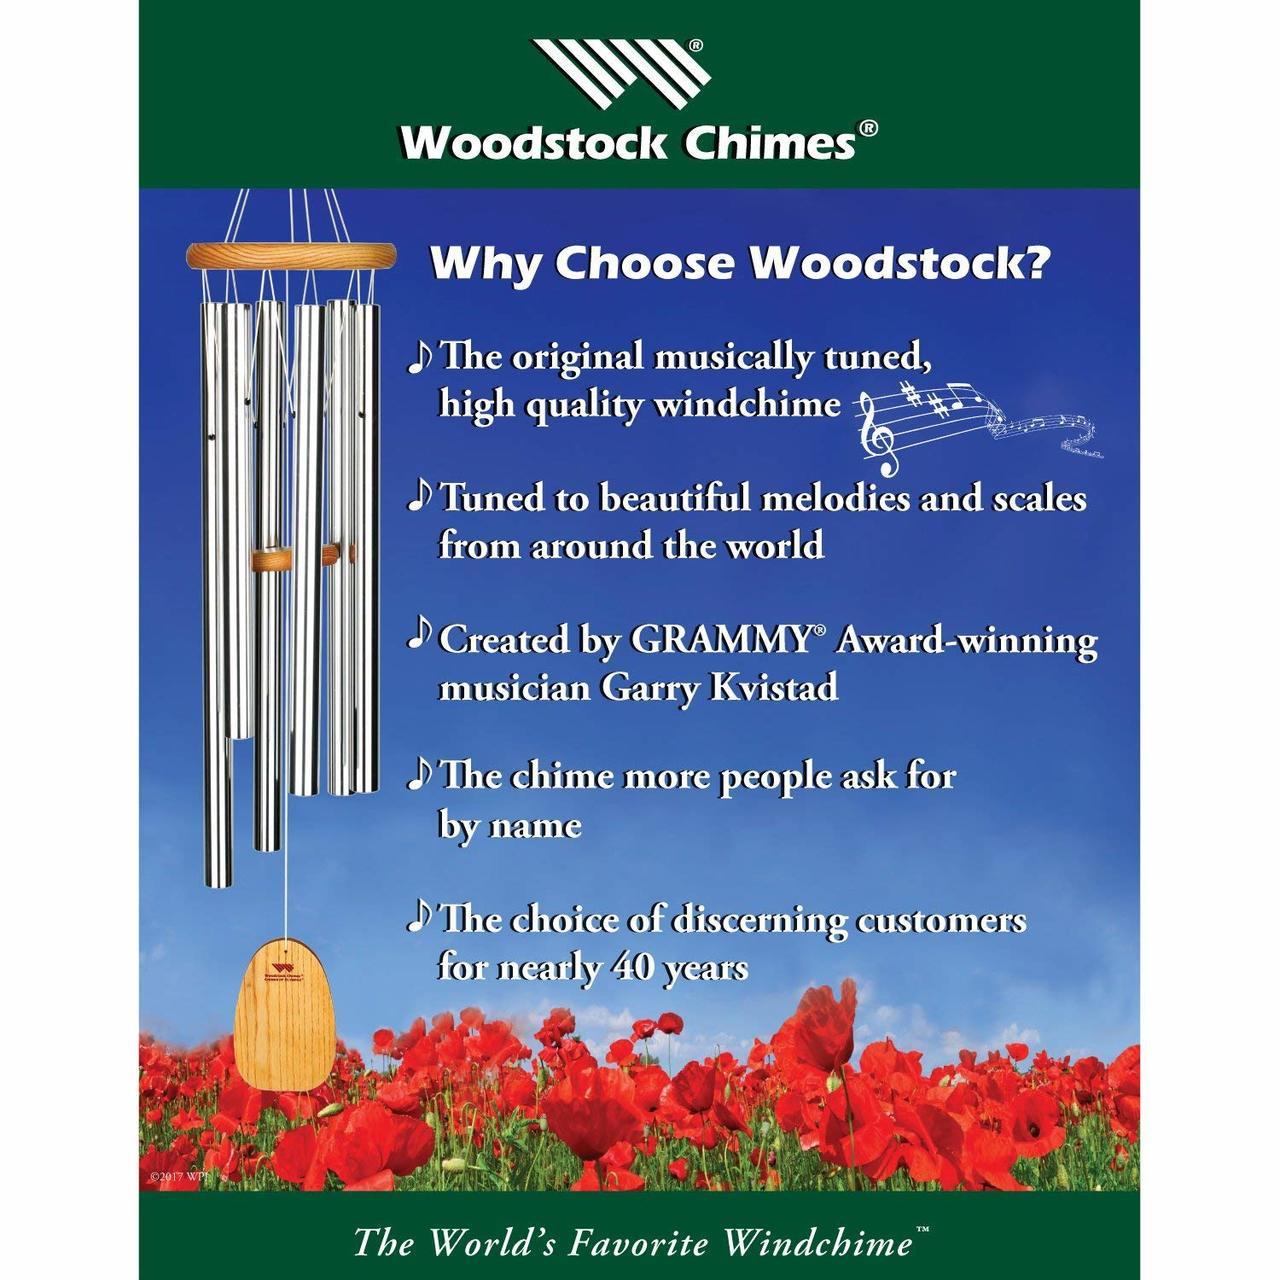 Woodstock Heroic Windbell Antique Copper Woodstock Chimes Grand